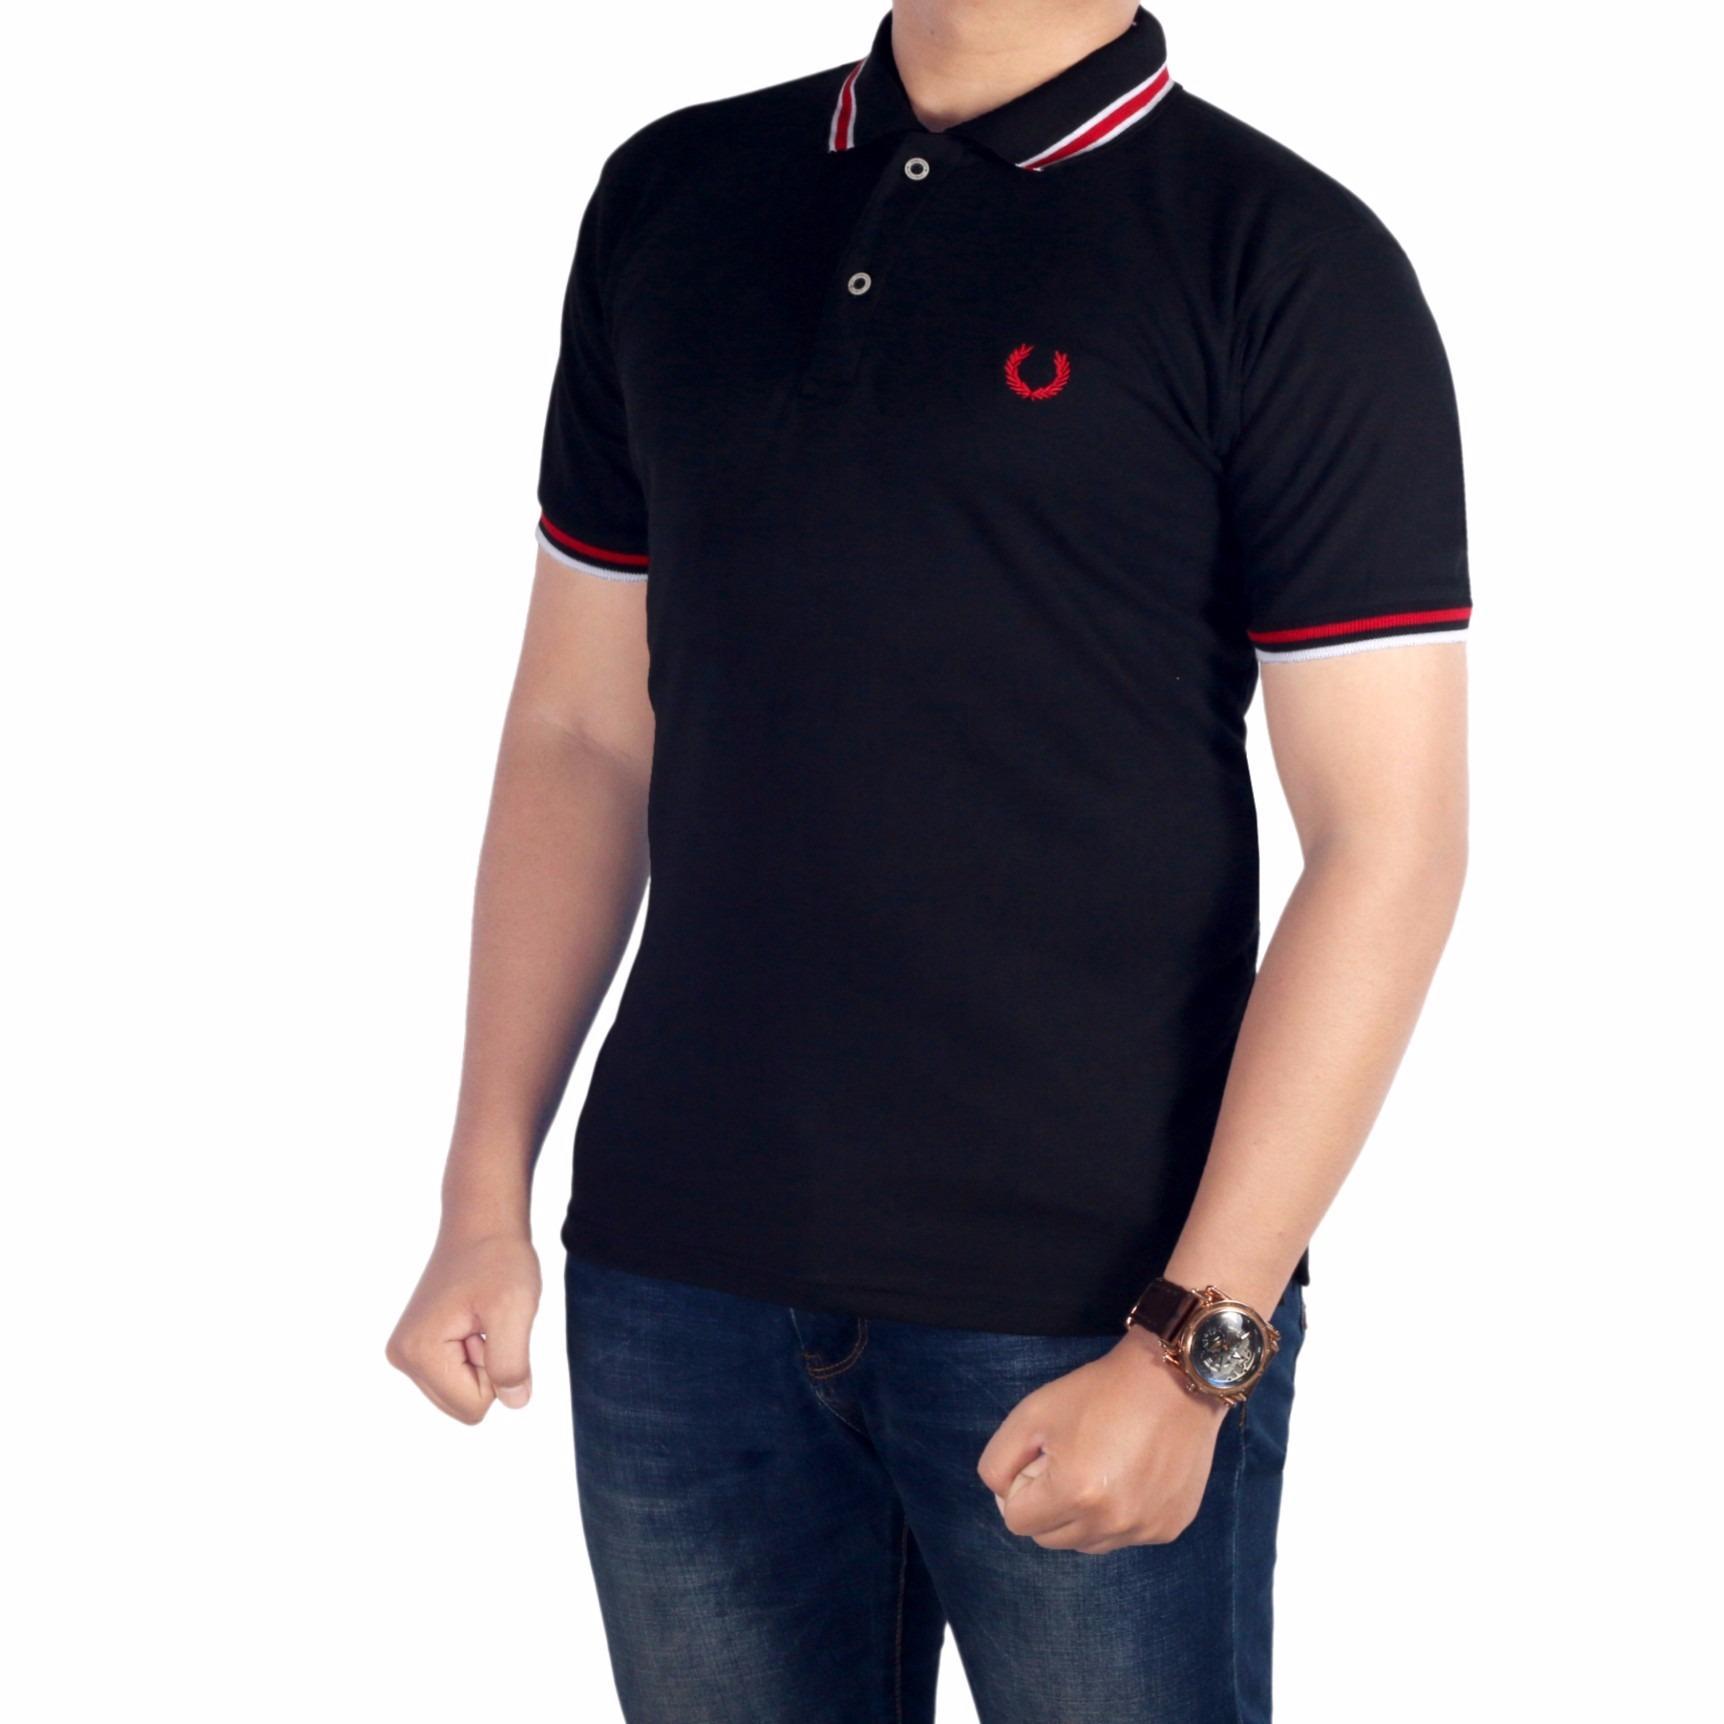 Review Dgm Fashion1 Baju Kaos Polo Hitam Polos Baju Pantai Kaos Pantai Kaos Polo Pantai Polo Shirt Kerah Sanghai Tribal Polo Shirt Polos Kaos Polos Polo Kaos Polo Kaos Polo Berkerah Kaos Polo Polos Kaos Kerah Polo Shirt Kaos Polo Pria Iu 3907 Dgm Fashion1 Di Dki Jakarta